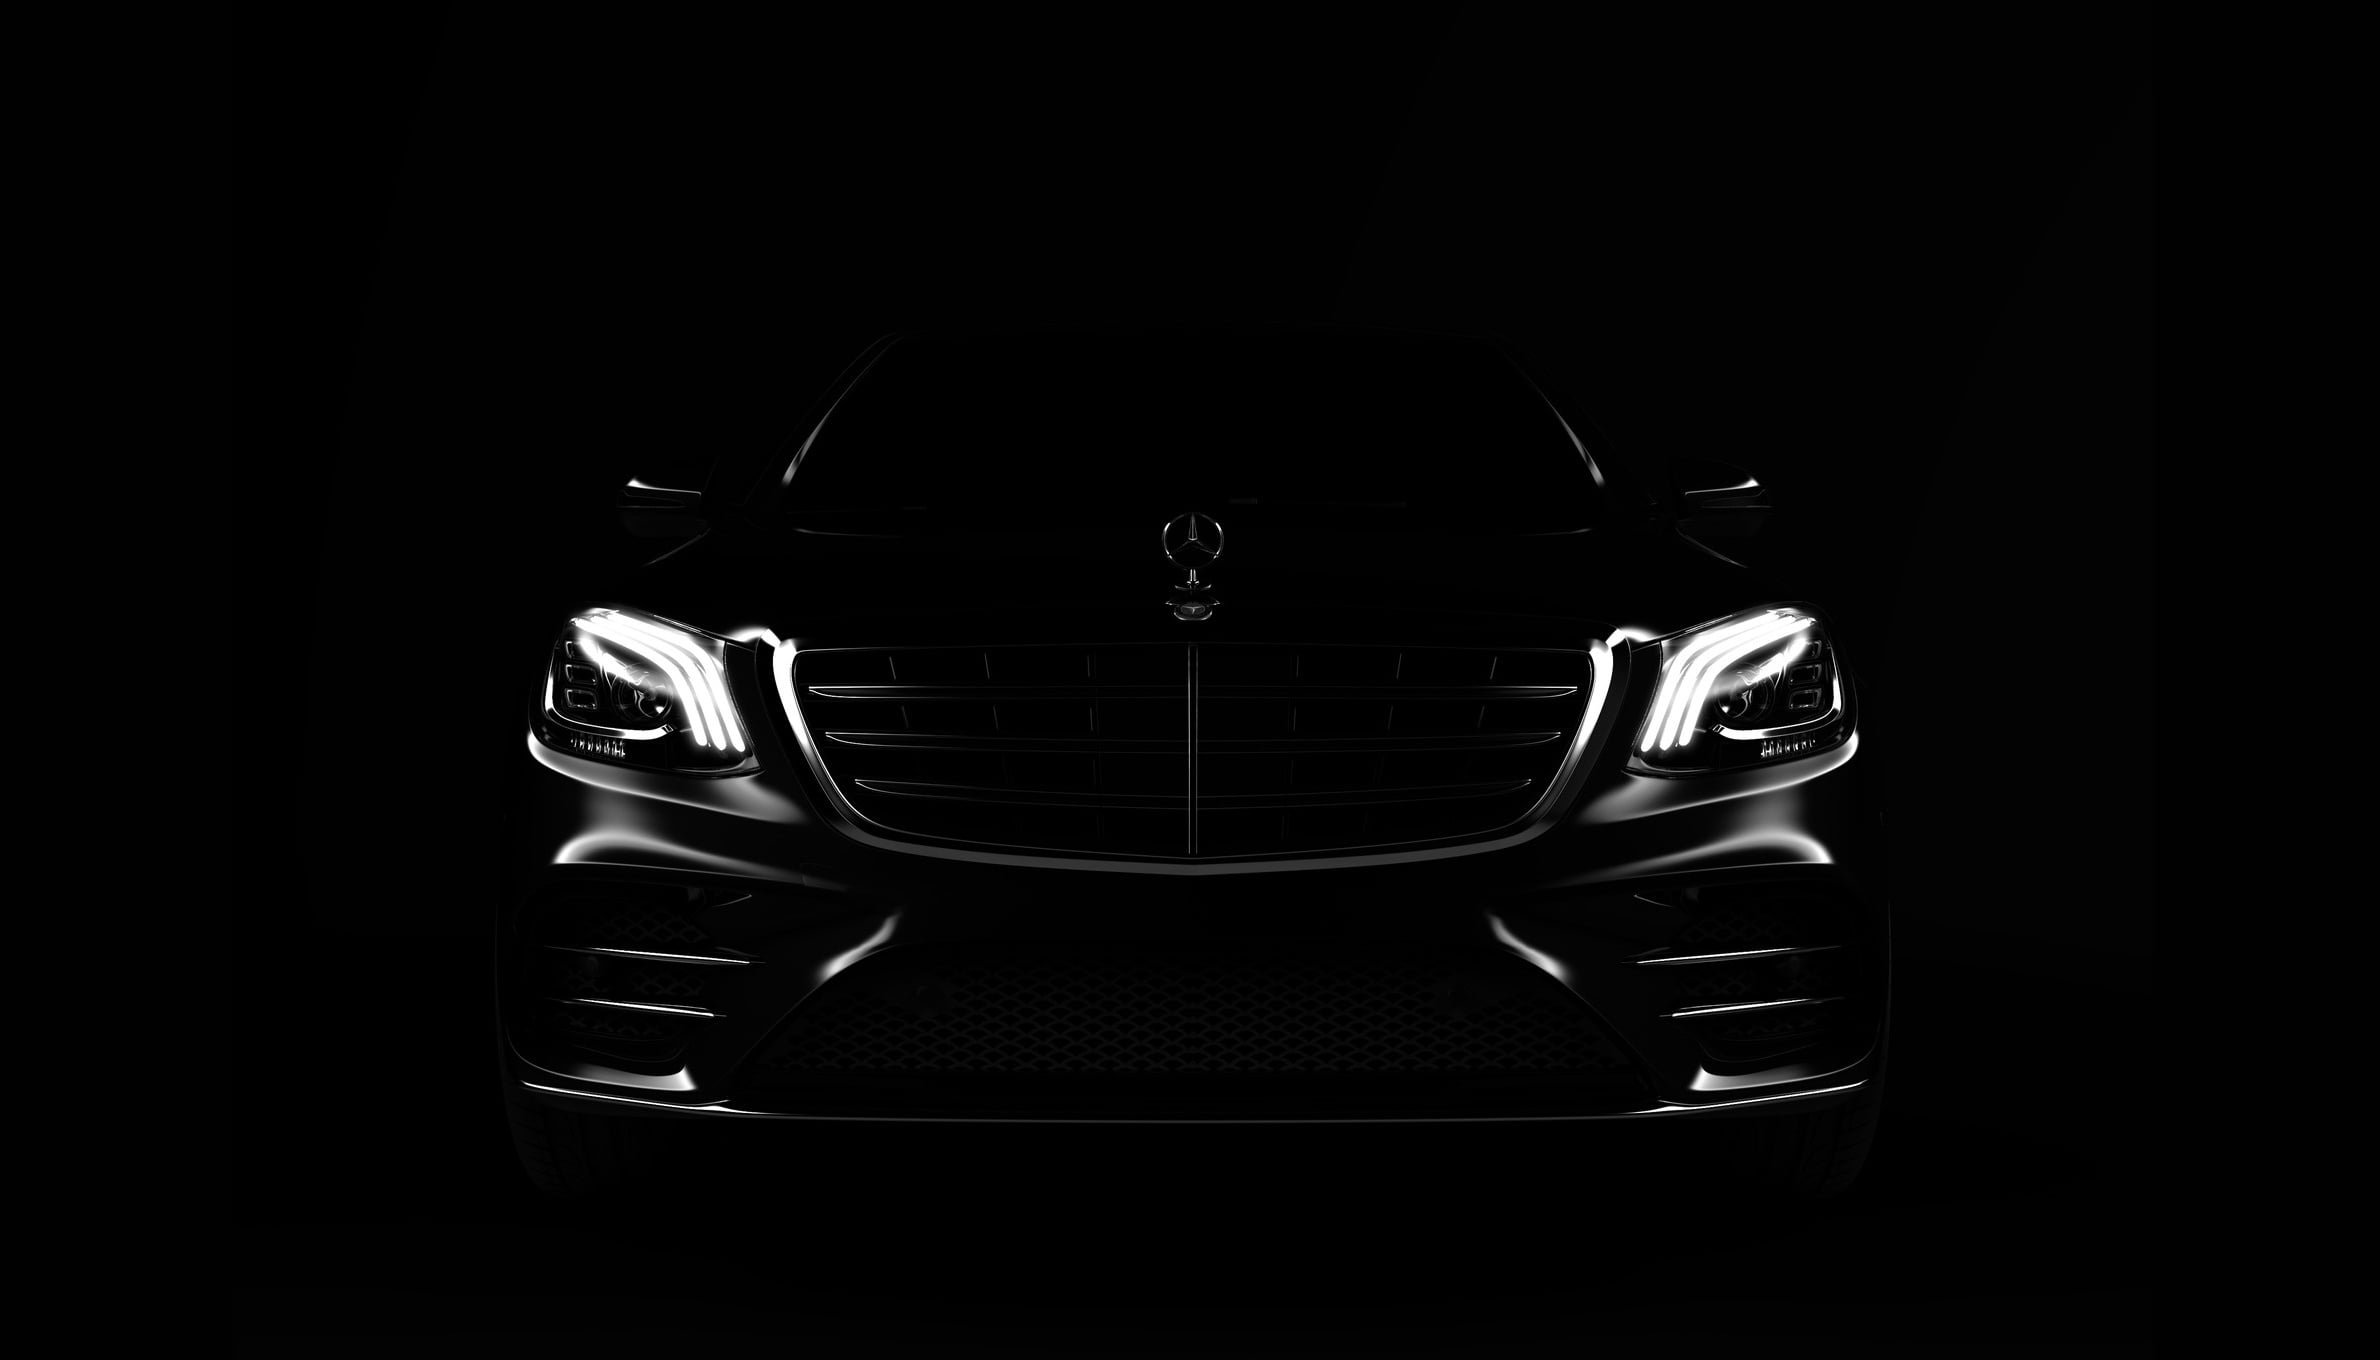 Cars Motos Wallpaper Wallpaper Dark Car Vehicle Mercedes Benz Artwork Wallpaper For You The Best Wallpaper For Desktop Mobile